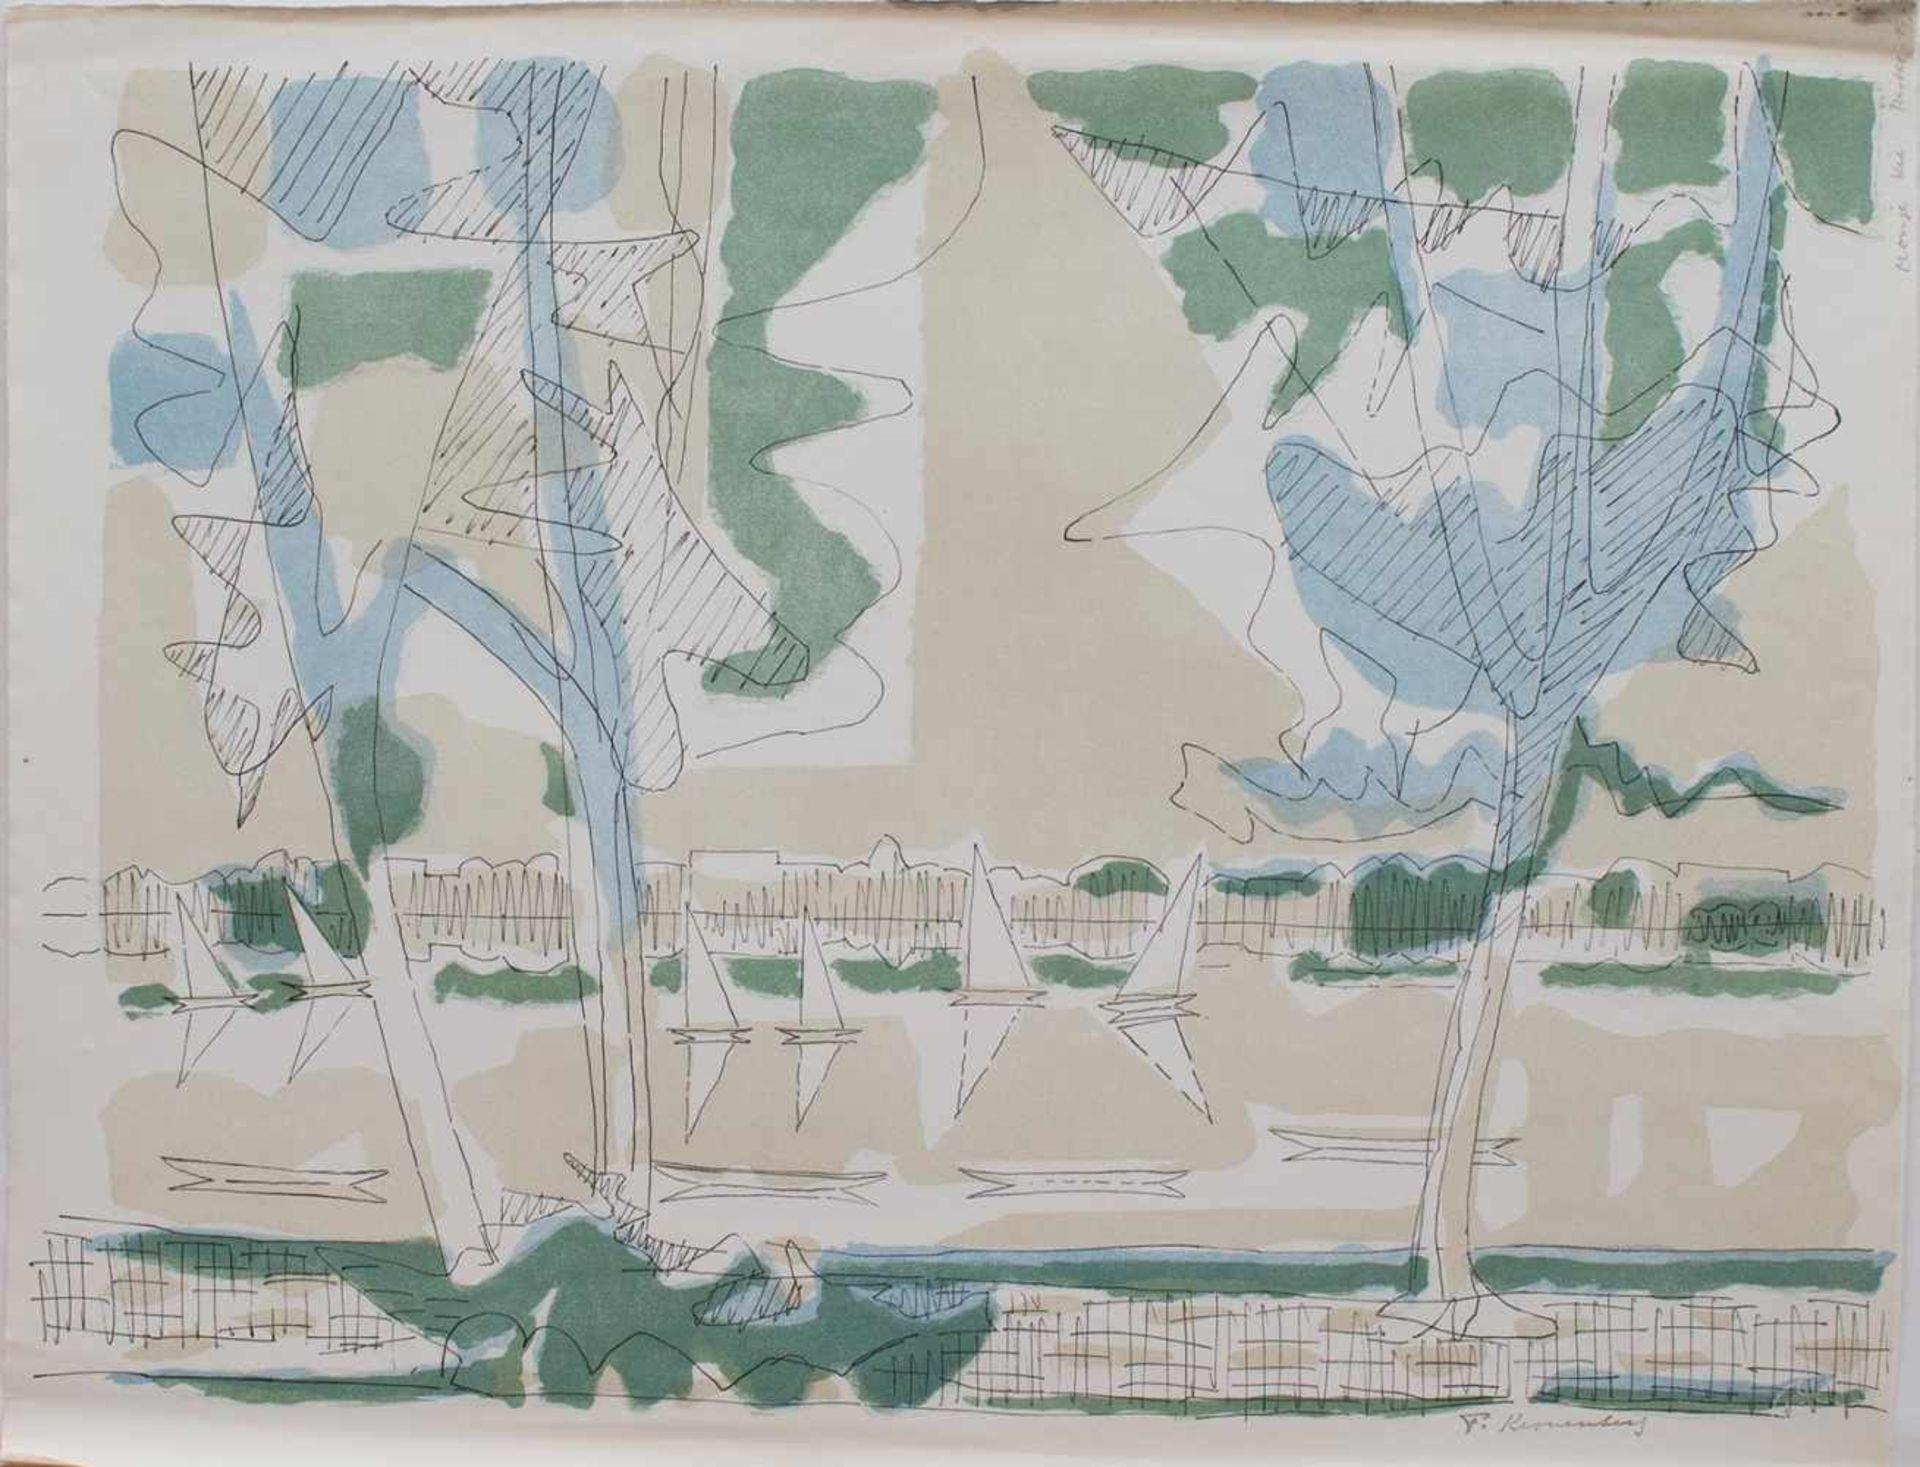 Los 18 - Fritz Kronenberg (Köln 1901 - 1960 Hamburg, deutscher Maler der Hamburger Sezession, Std. a.d. KA